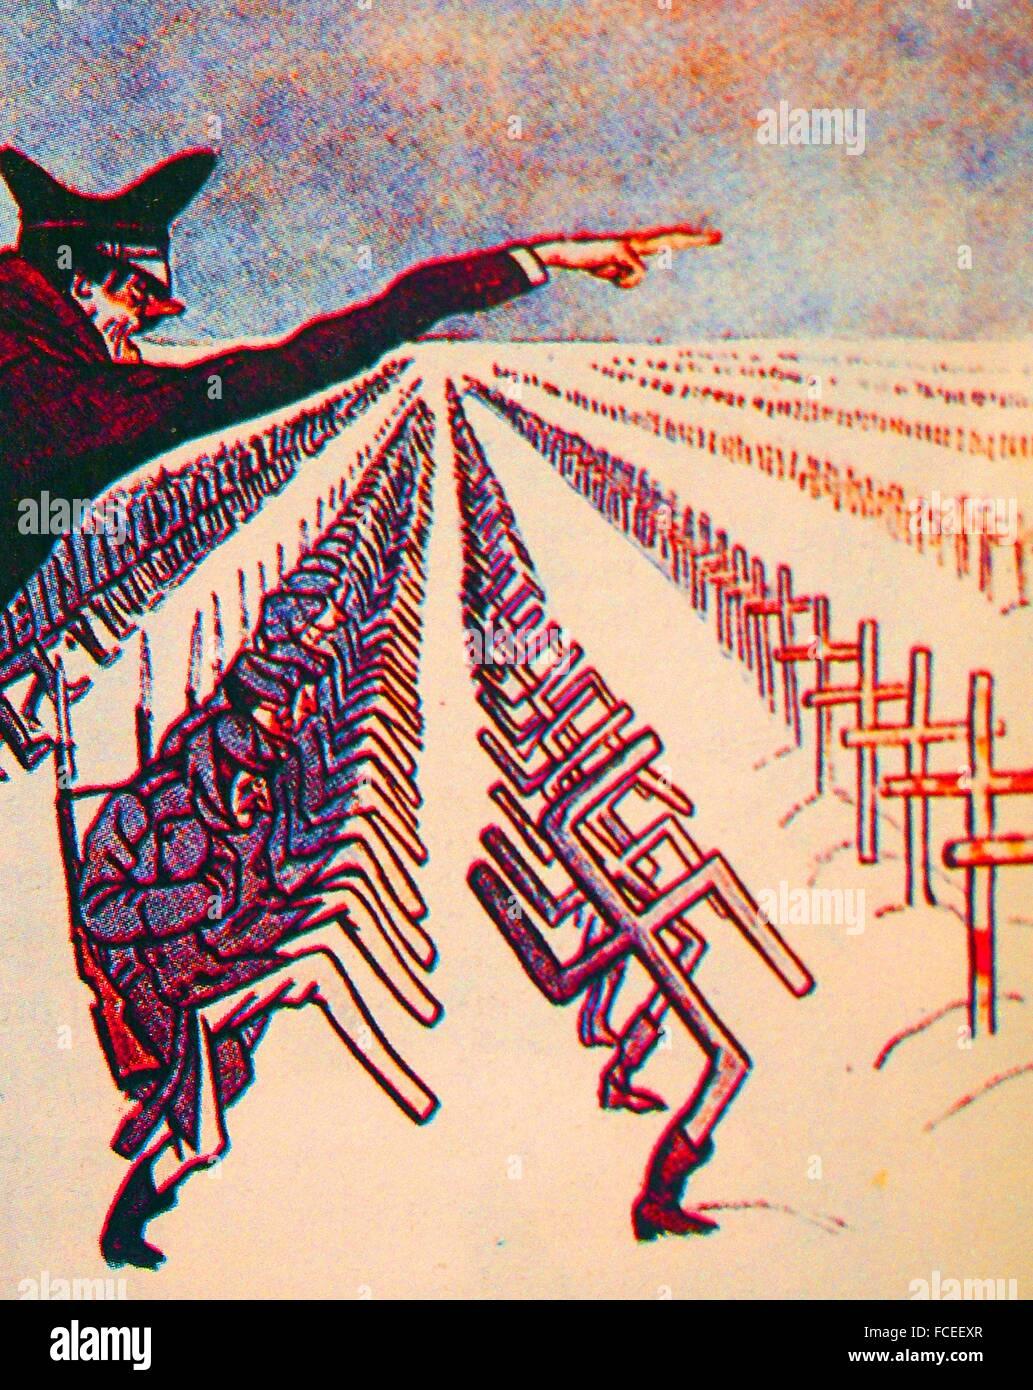 USSR- World War II- Soviet caricature, 1943, of Hiltler sending soldiers to USSR. - Stock Image